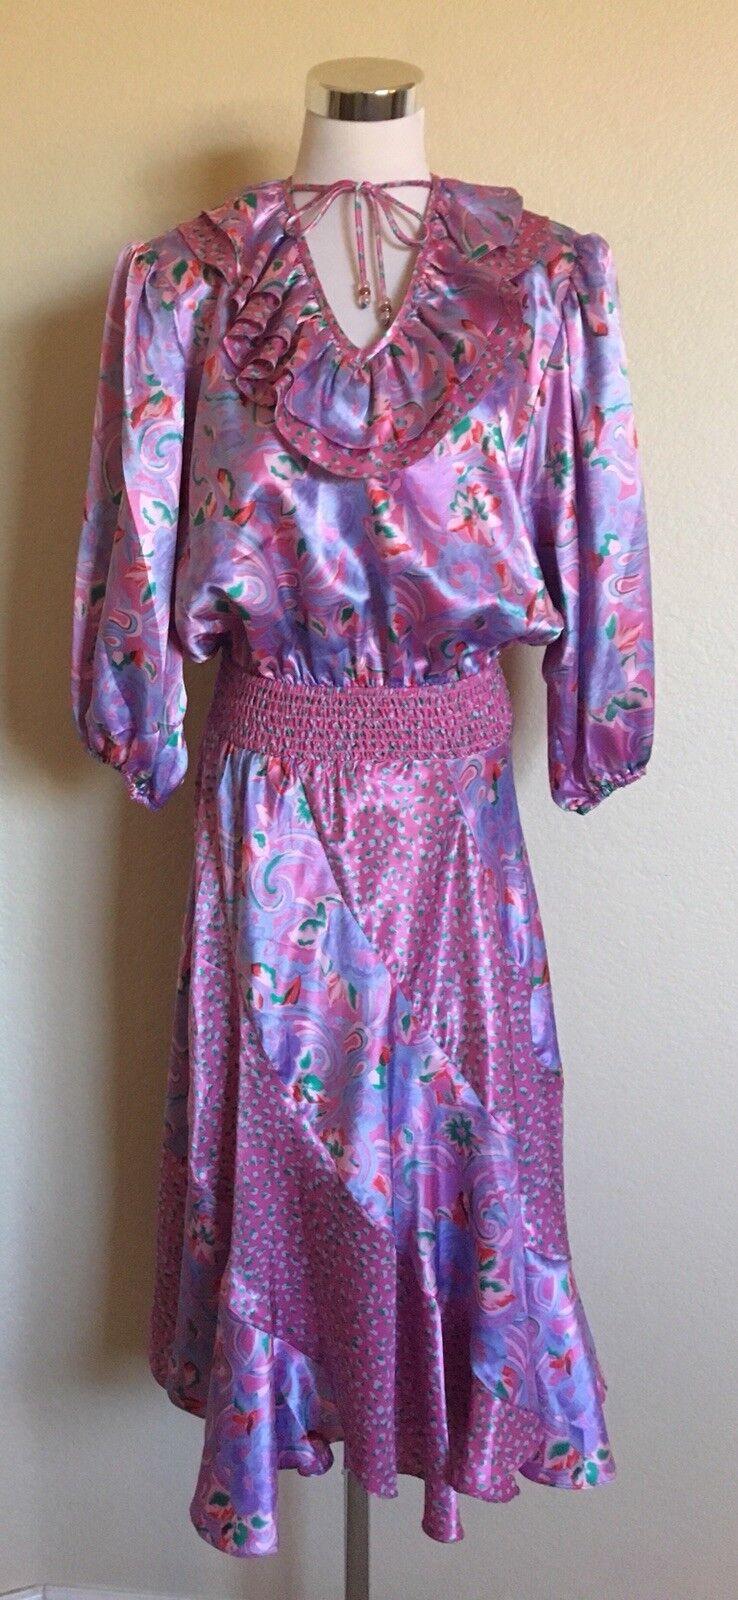 3a1f1a3803ee Susan Freis VINTAGE Pink Purple Floral Ruffle Boho Satin Dress Size Medium